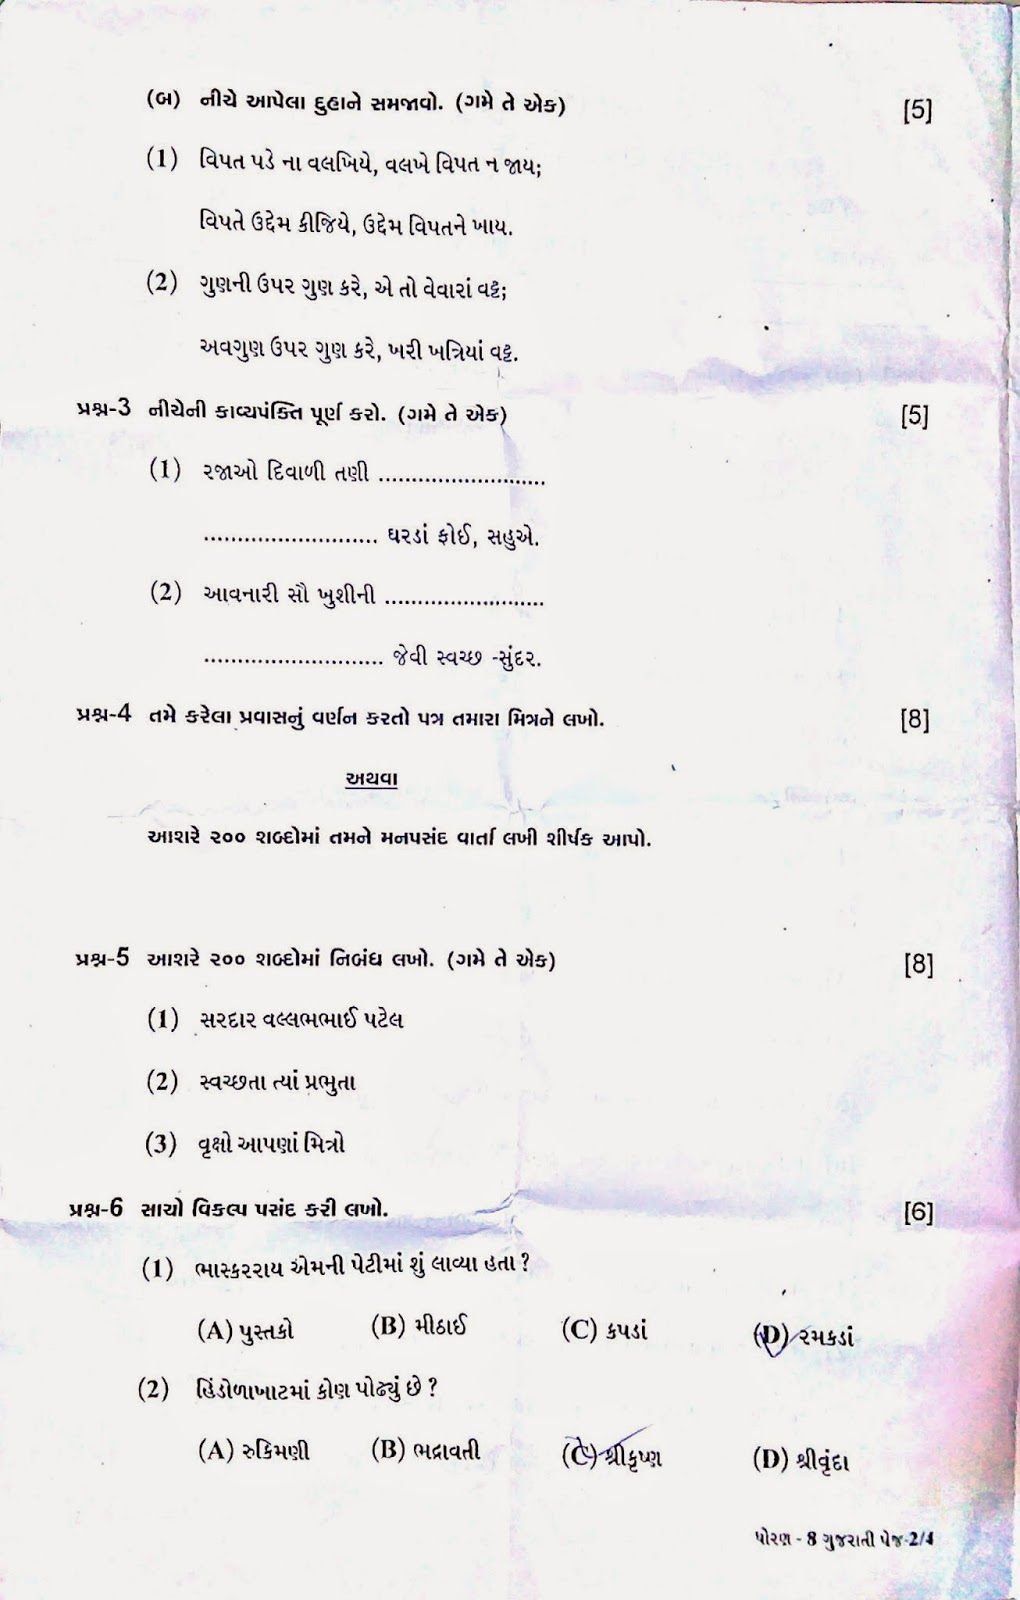 gujarati paper Economic times business newspaper's gujarati website delivers business news, stock market news, personal finance news, gujarat samachar, gujarati news and much more in gujarati language.